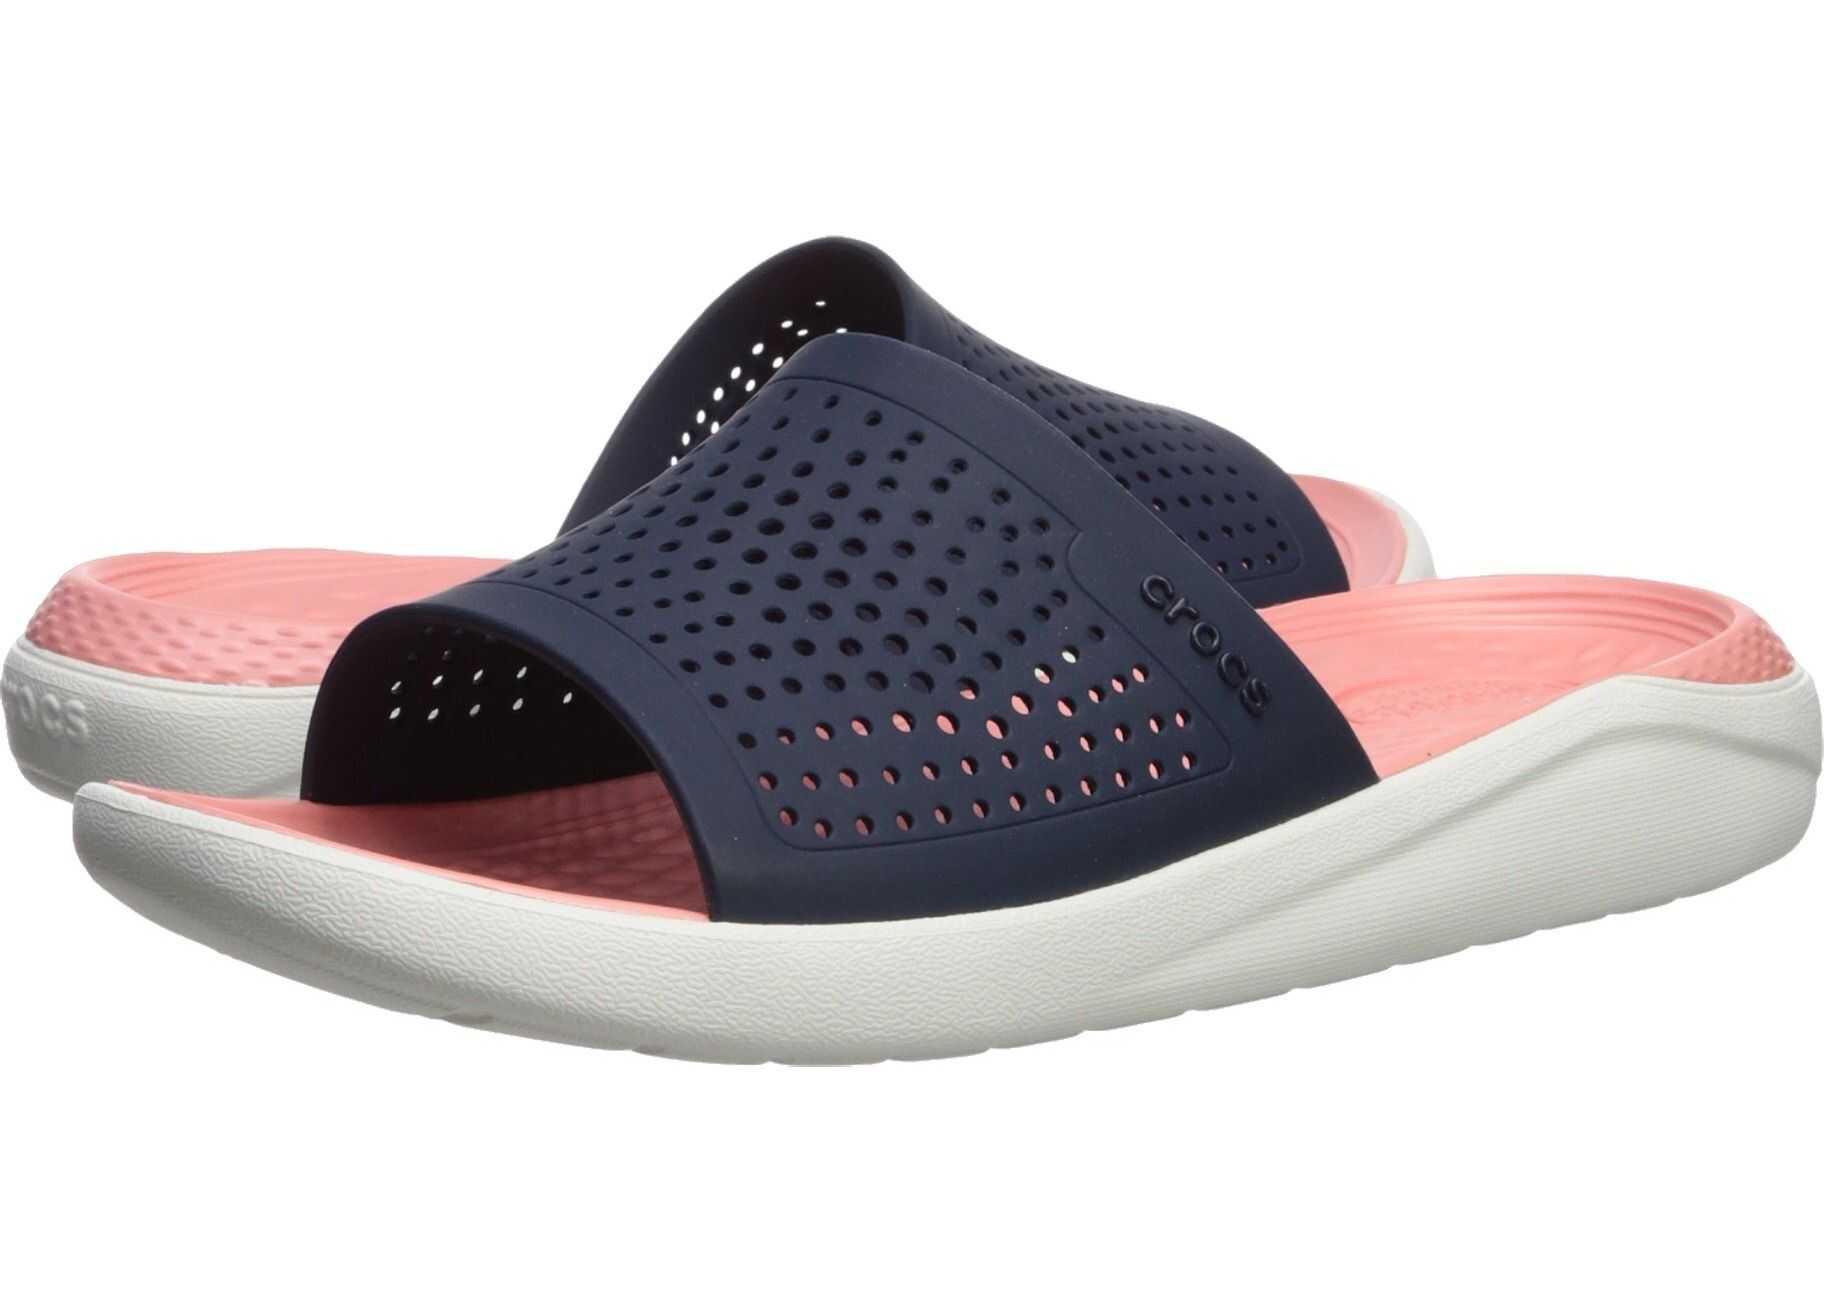 Crocs LiteRide Slide Navy/Melon 1